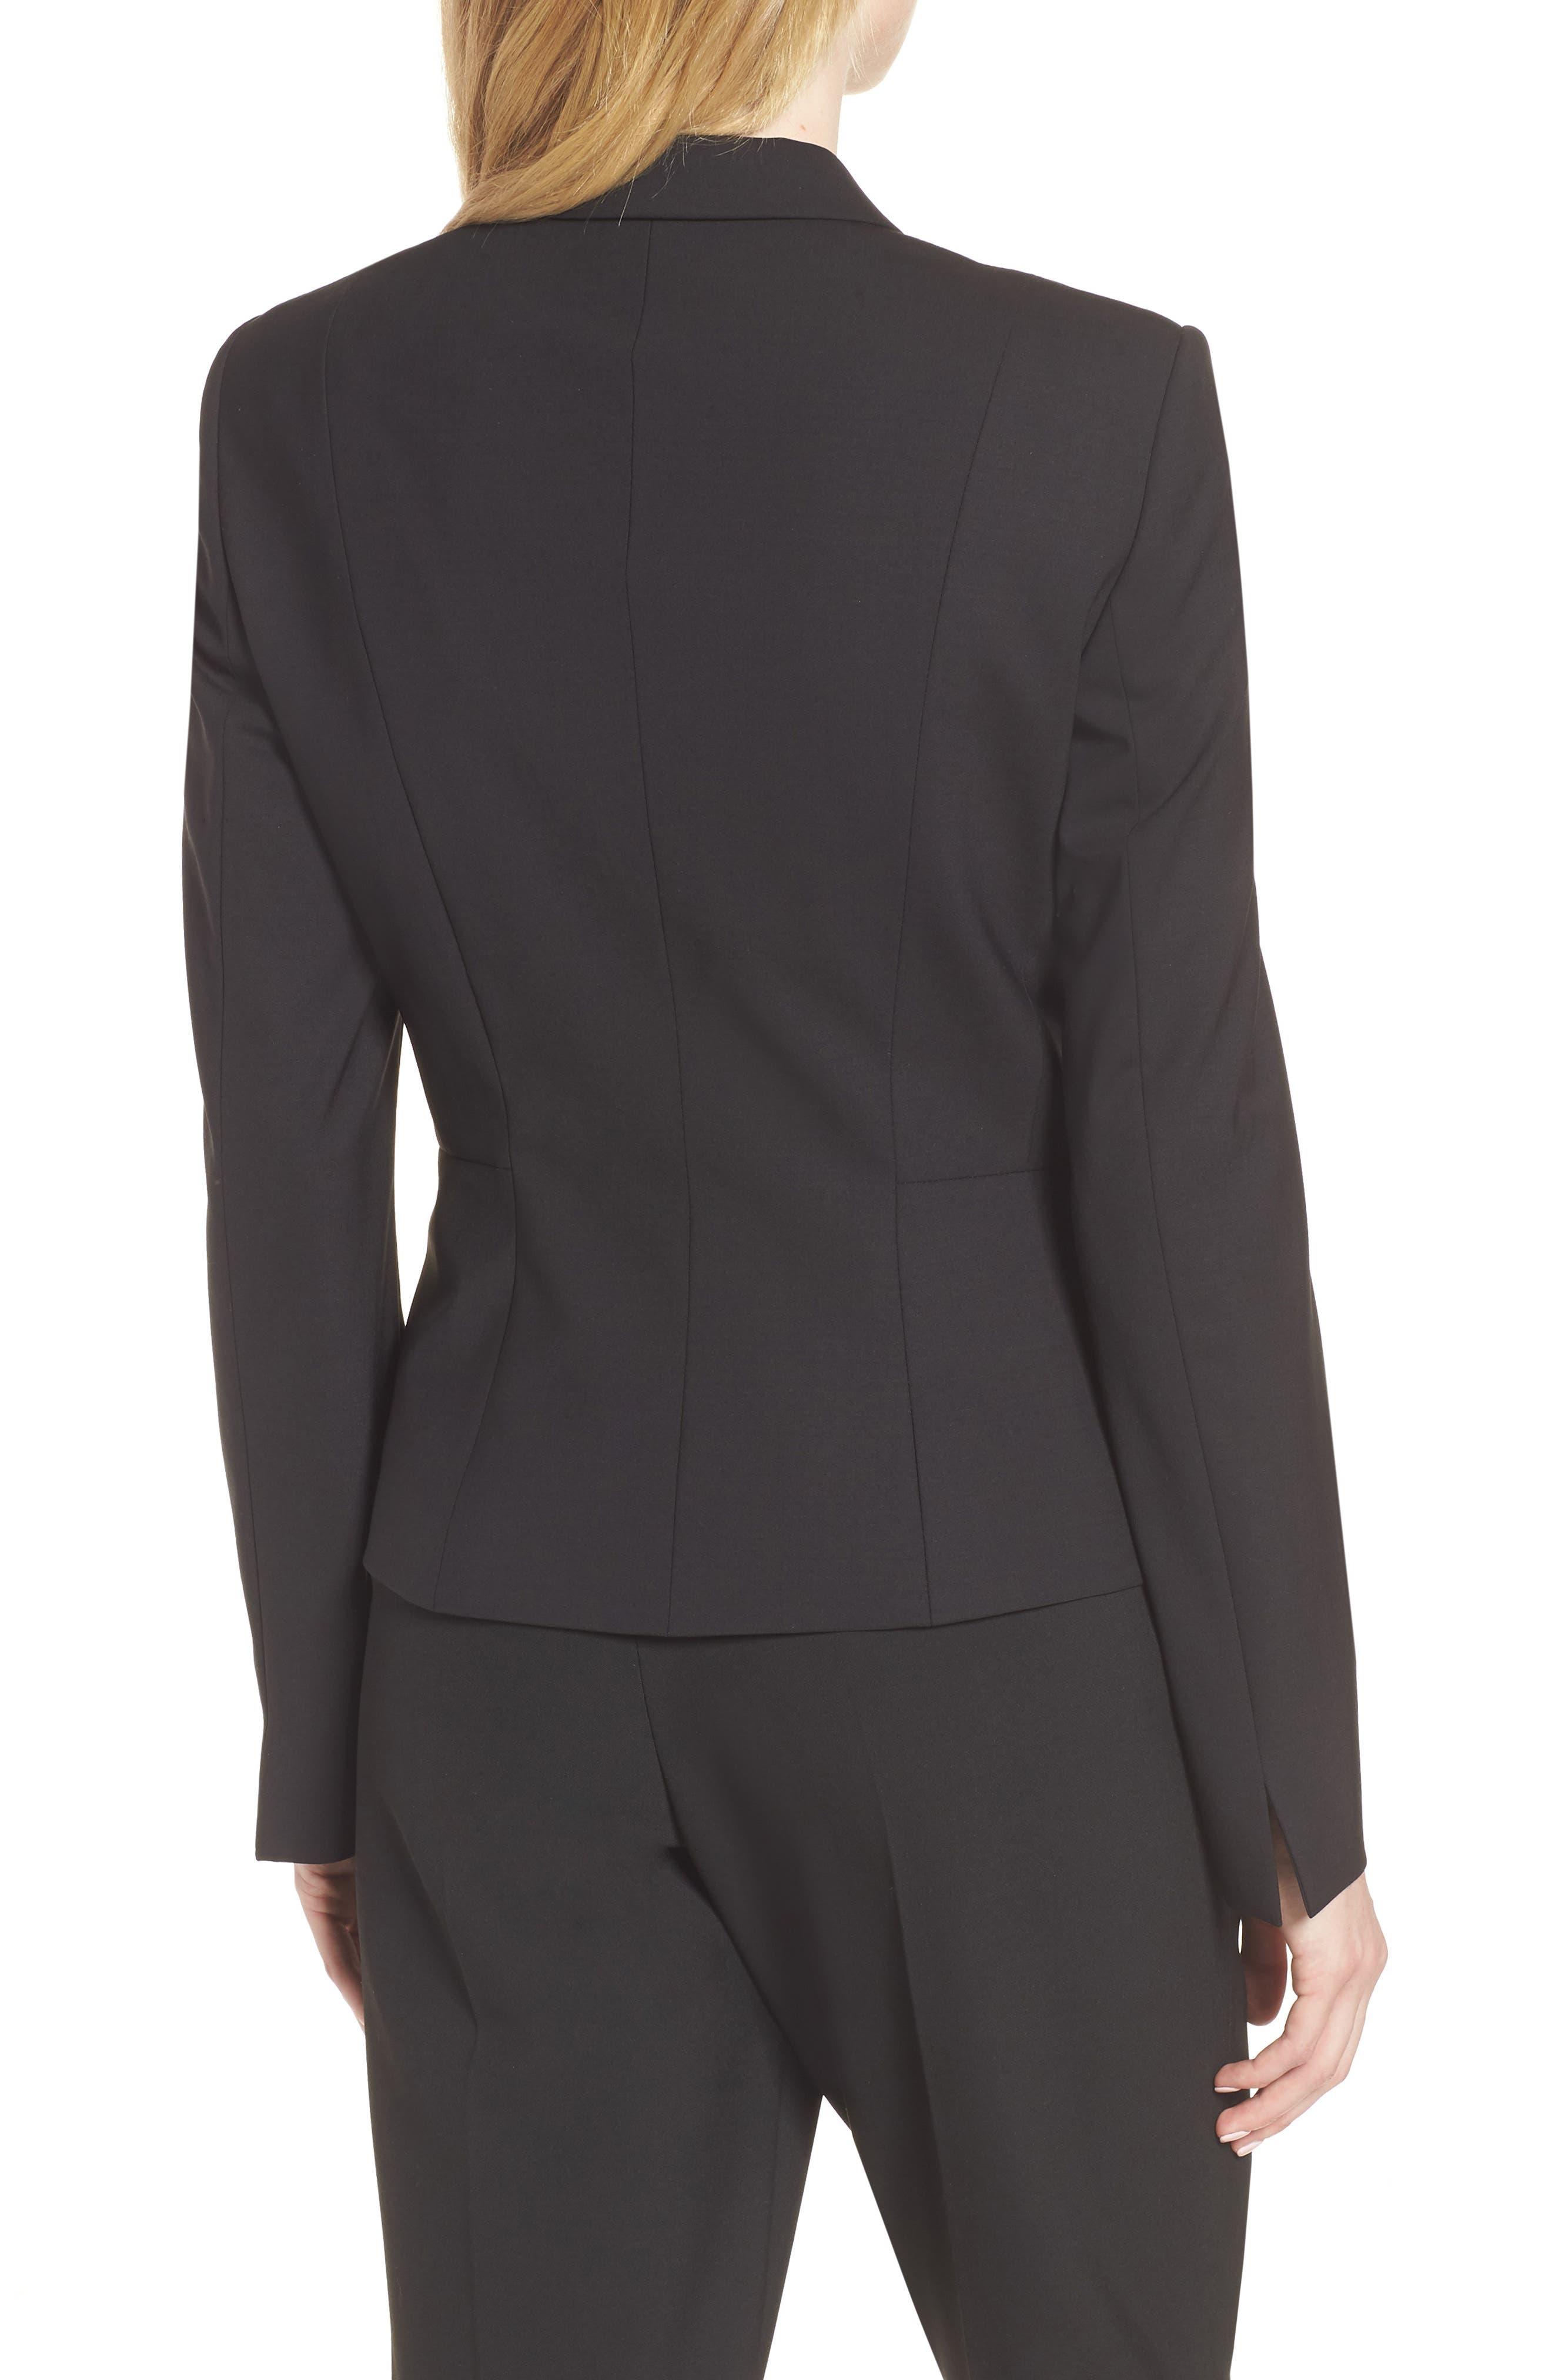 Jaru Stretch Wool Suit Jacket,                             Alternate thumbnail 2, color,                             Black